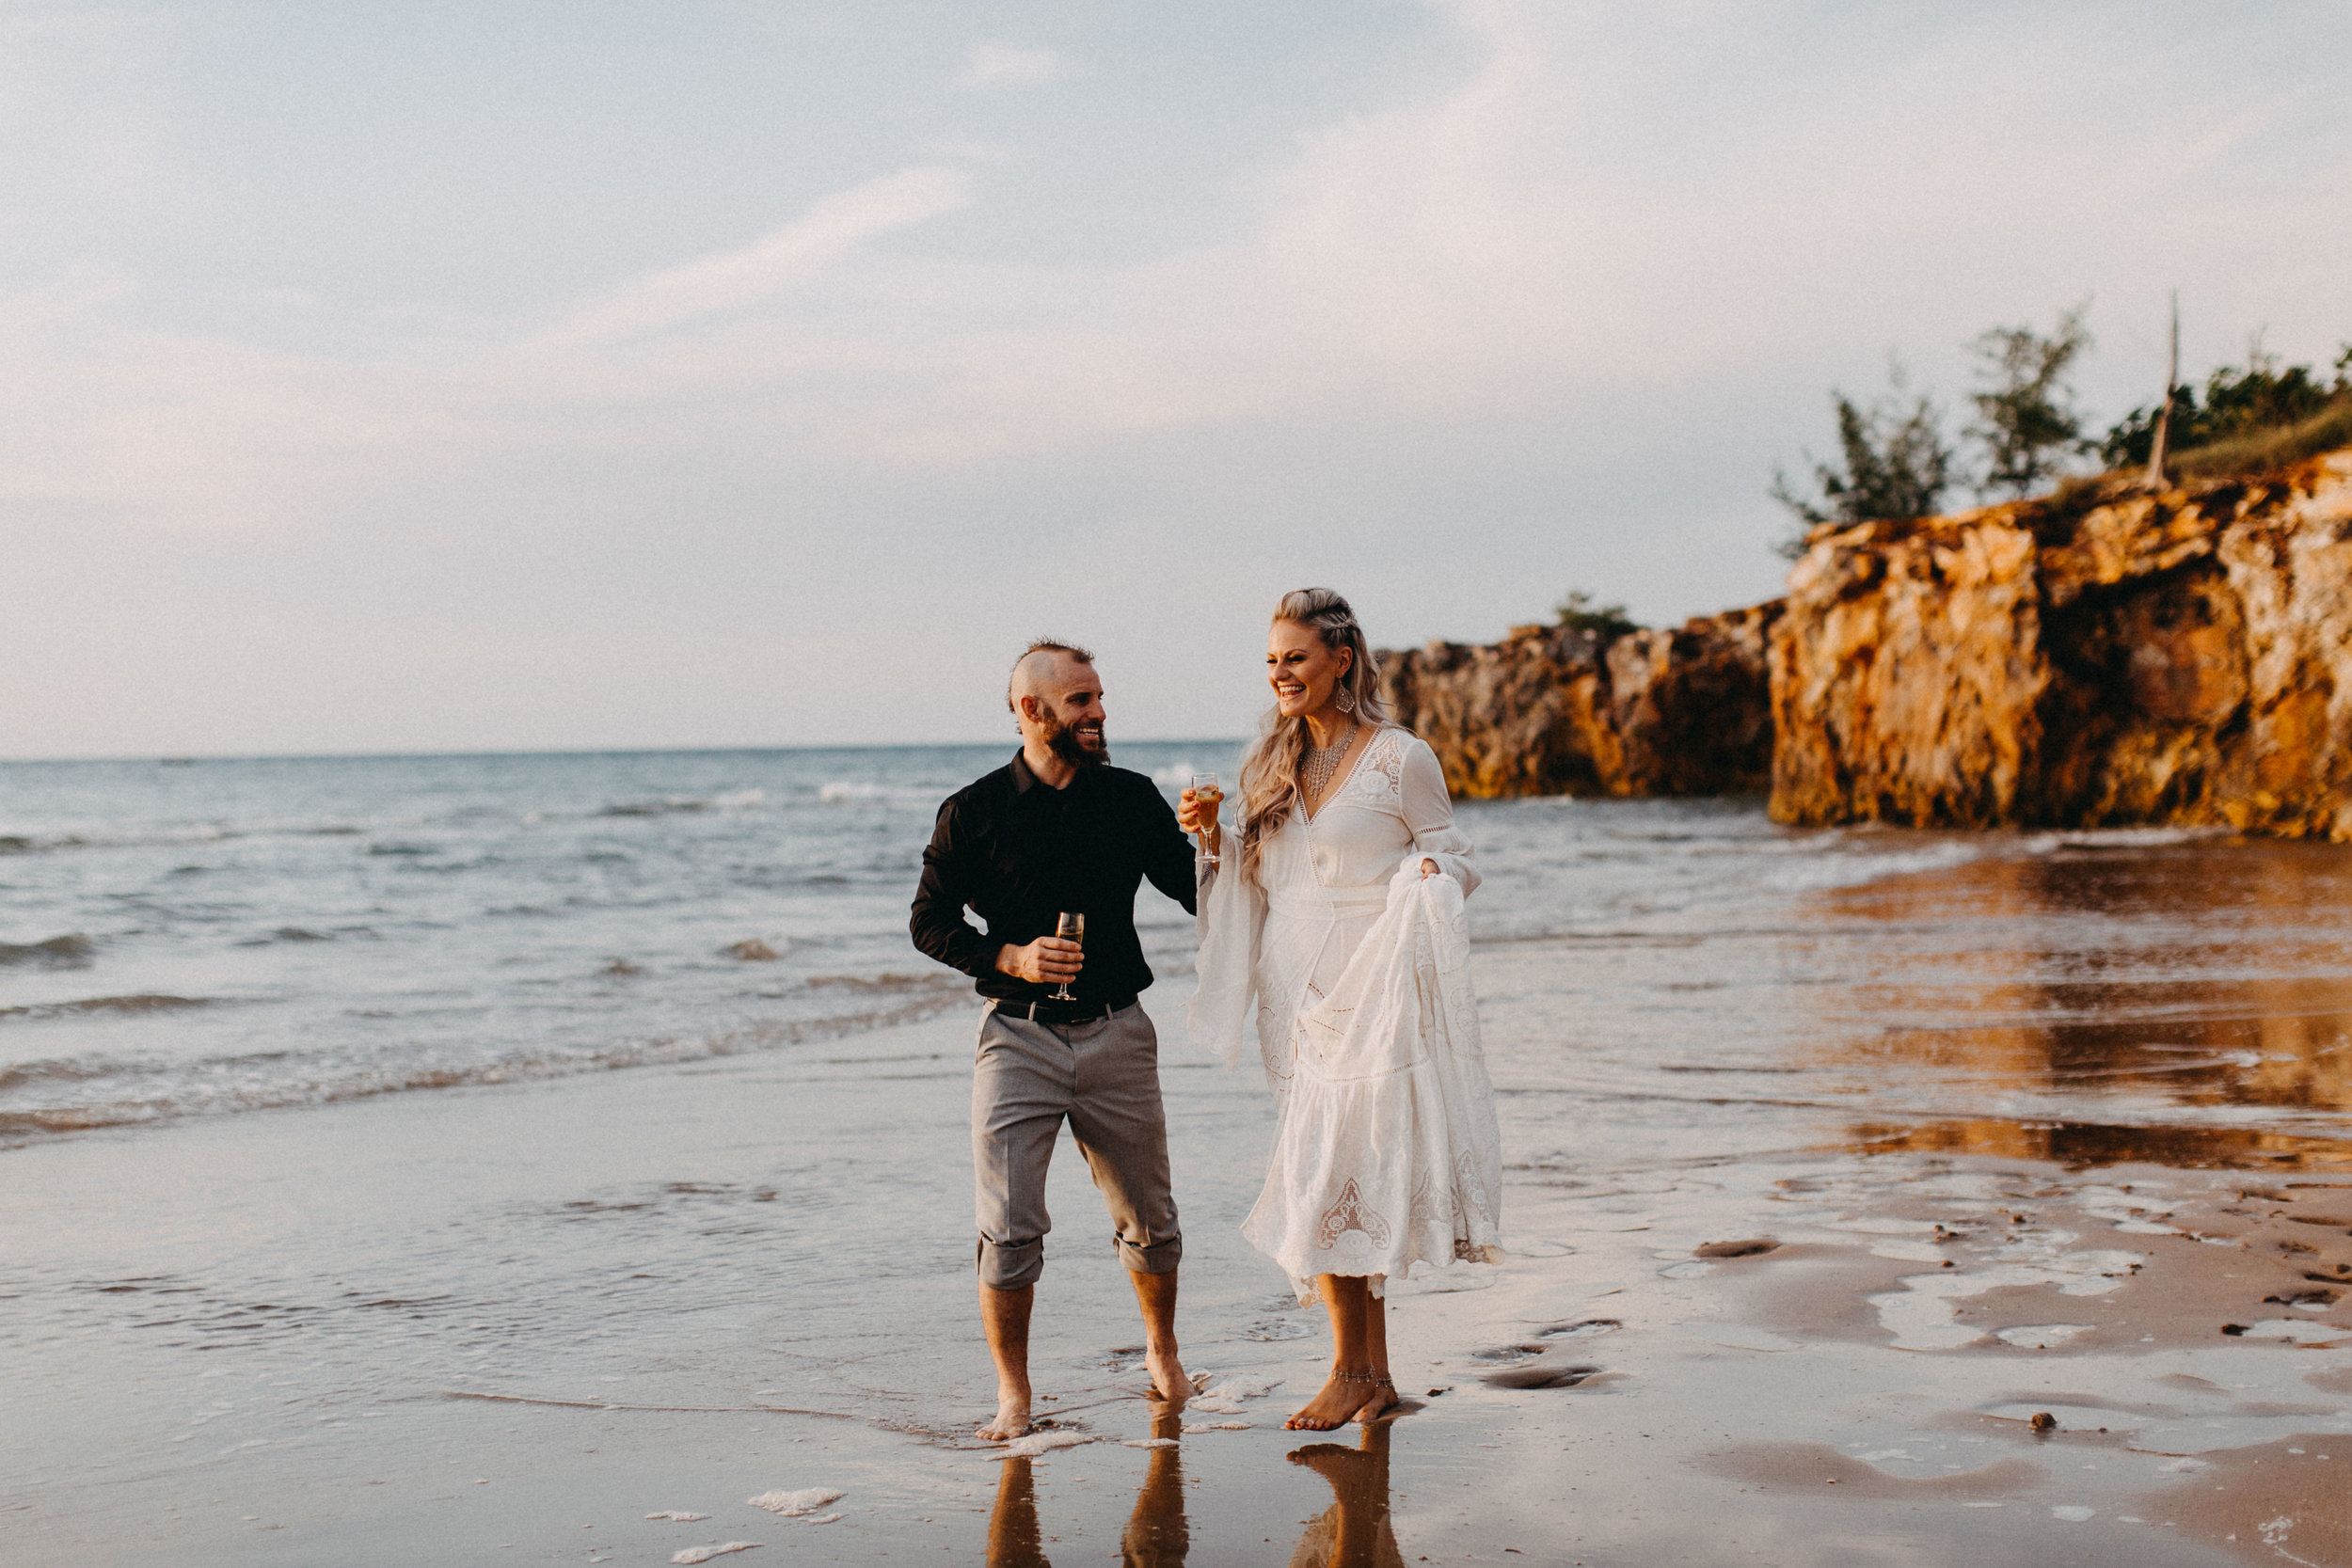 darwin-elopement-wedding-beach-camden-photography-www.emilyobrienphotography.net-72.jpg